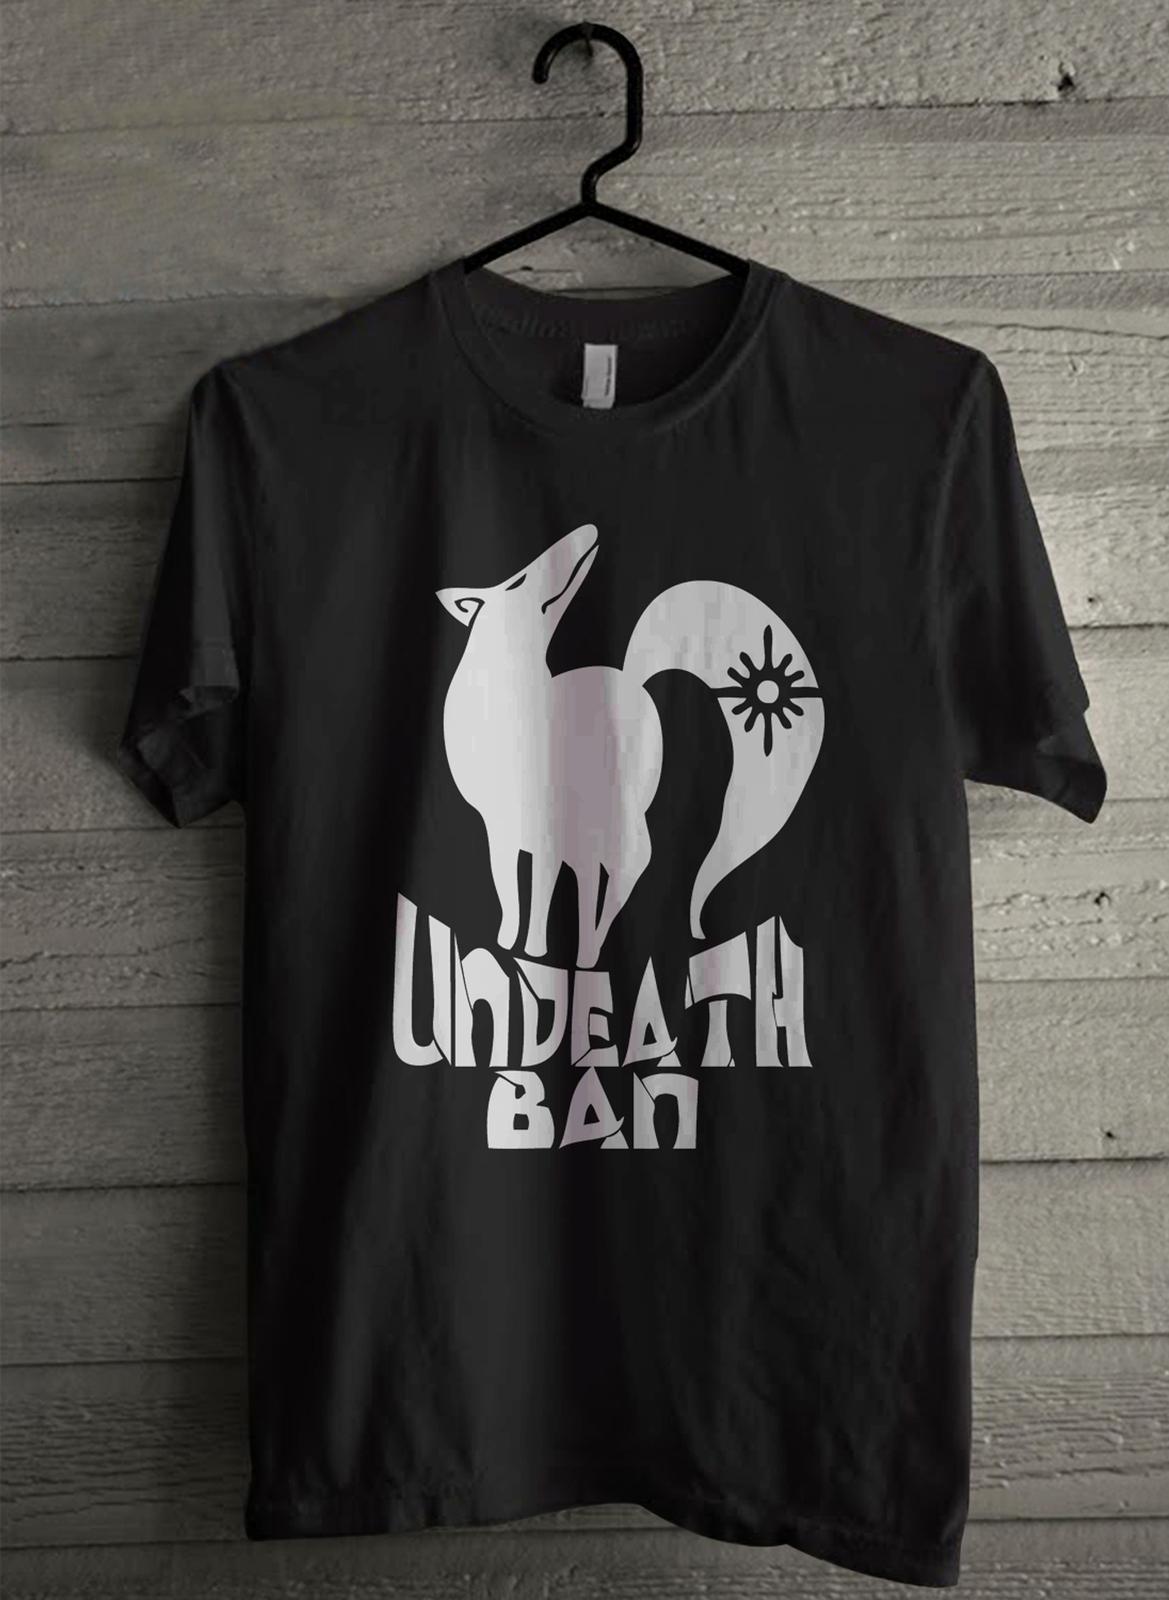 The Undeath Ban - Custom Men's T-Shirt (1277)